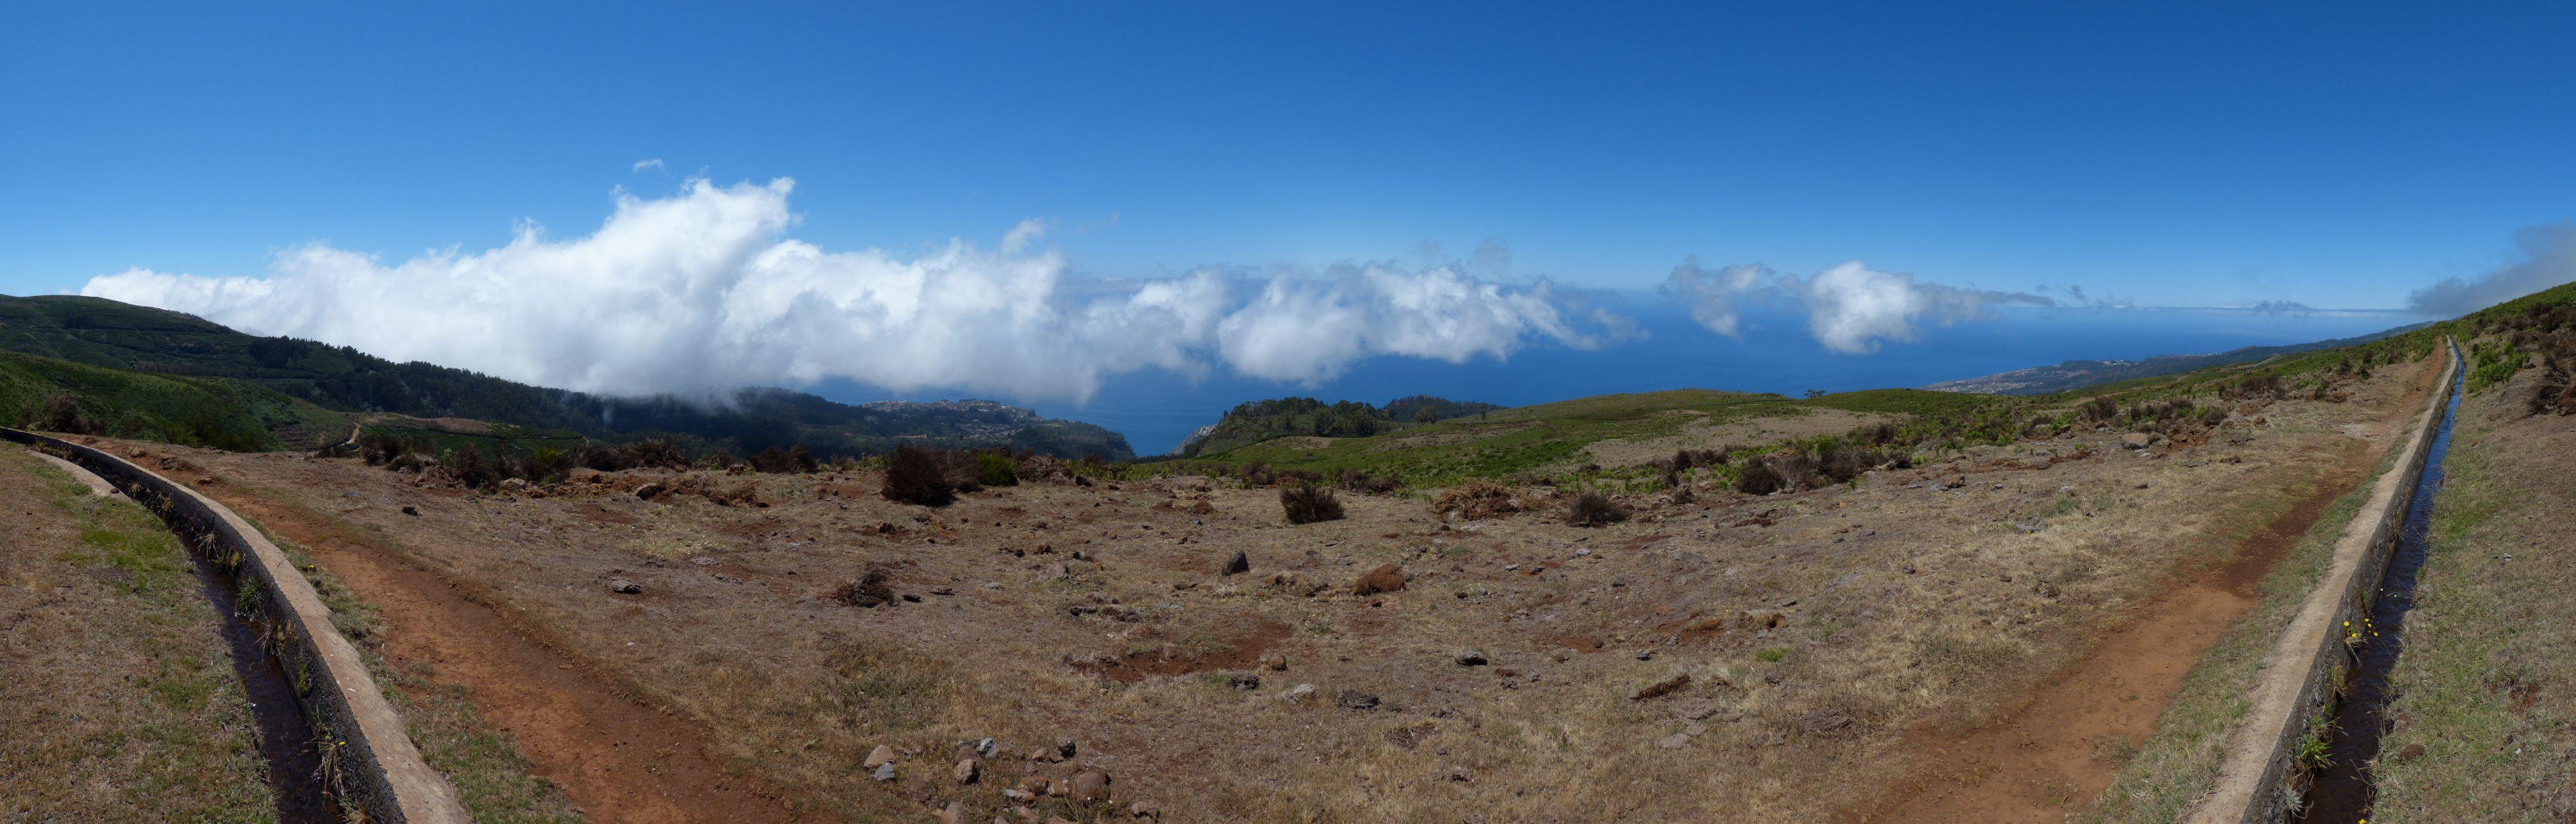 180° Panoramaufnahme der Südküste